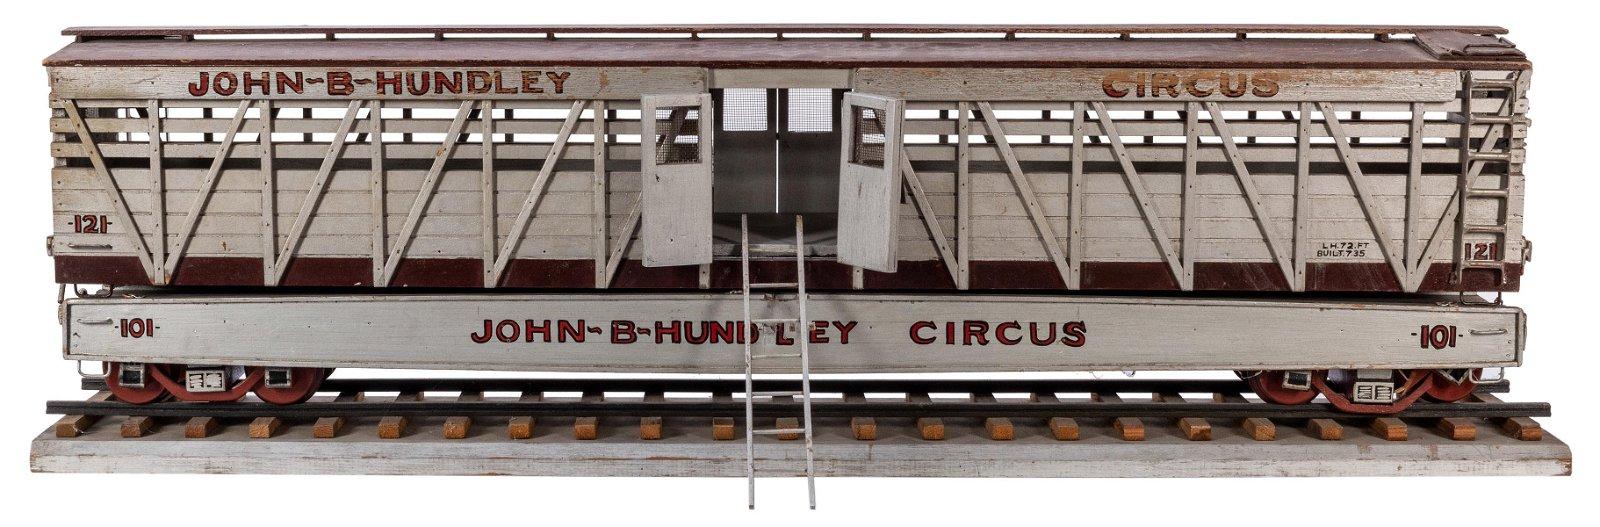 John B. Hundley Circus Animal Model Train Car.